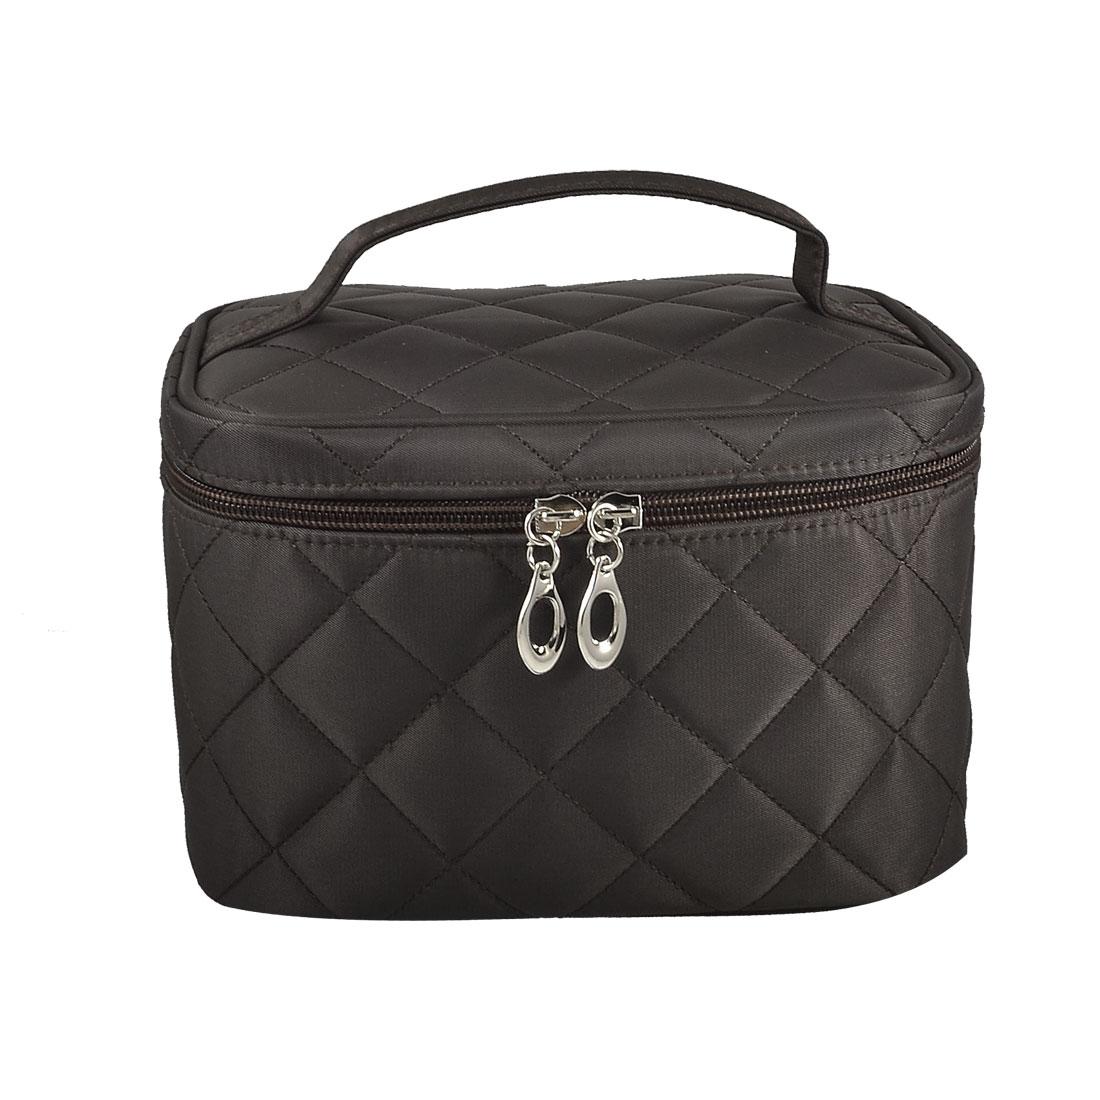 Dark Brown Plaid Zipper Toiletry Case Makeup Cosmetic Bag Organizer w Mirror